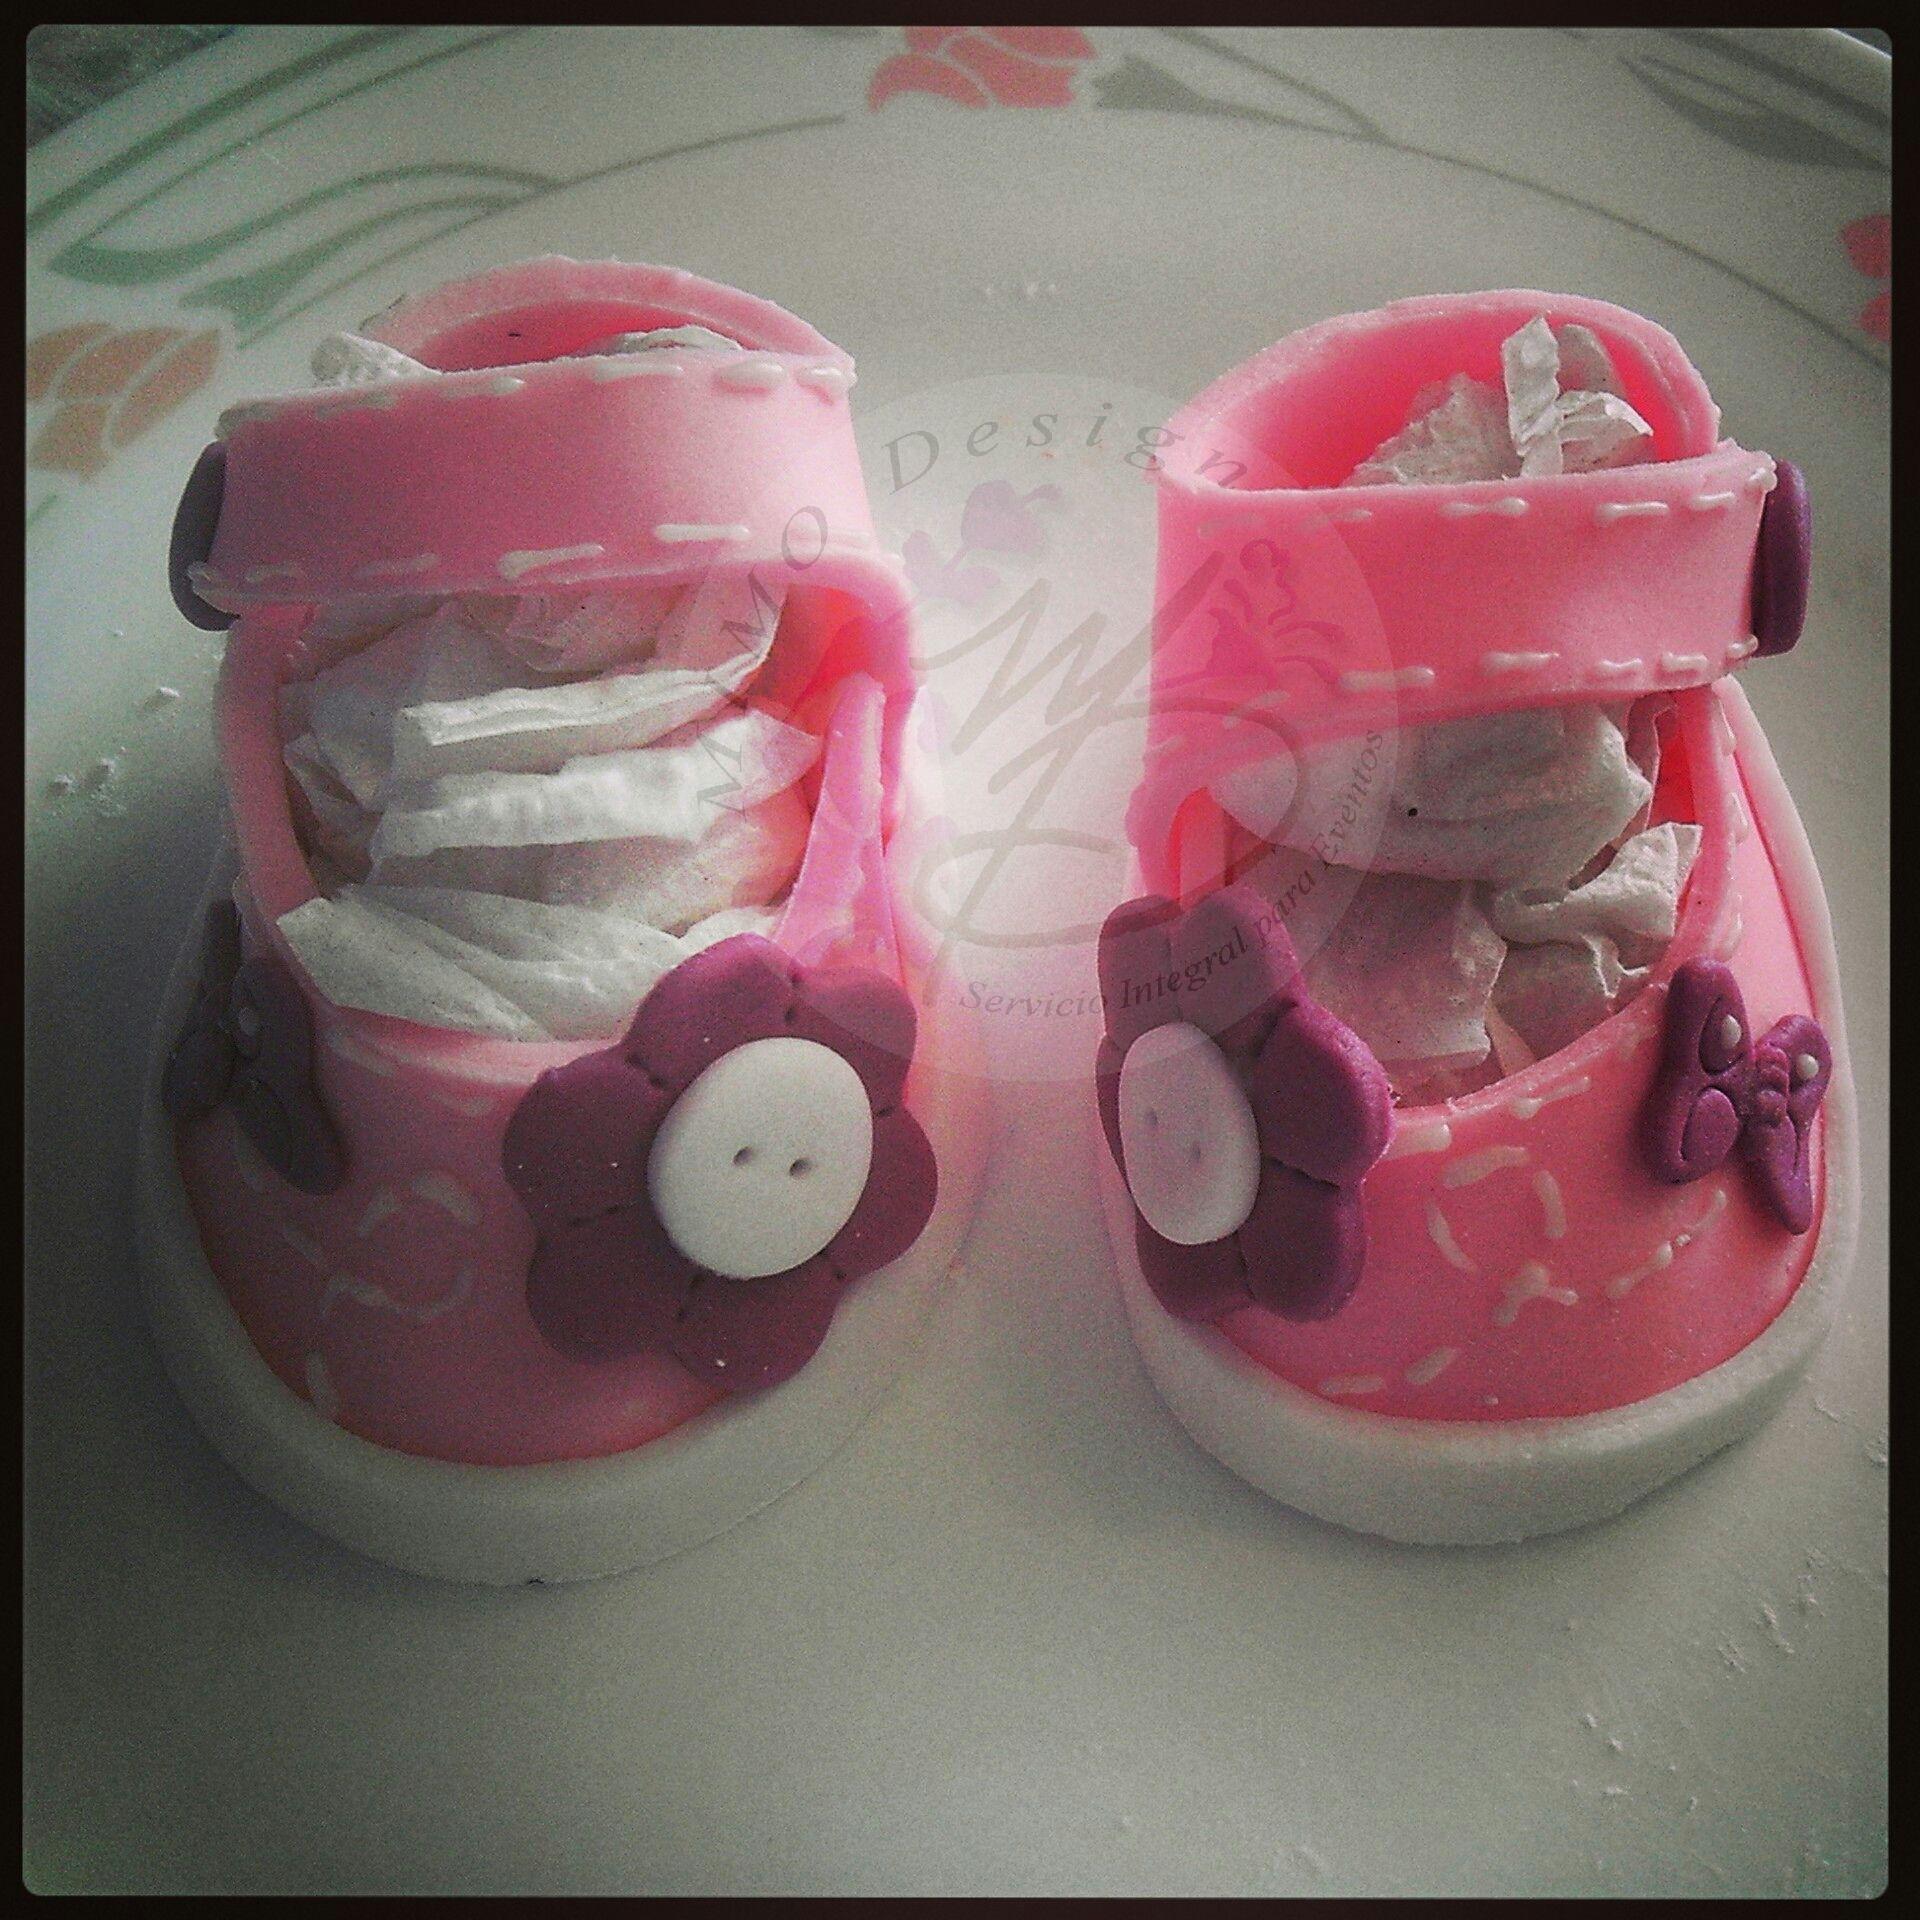 zapatitos en fondant Baby shower  https://www.facebook.com/MIMODESIGN.PASTELESCUPCAKES.MESAPOSTRESBOTANAS?fref=ts